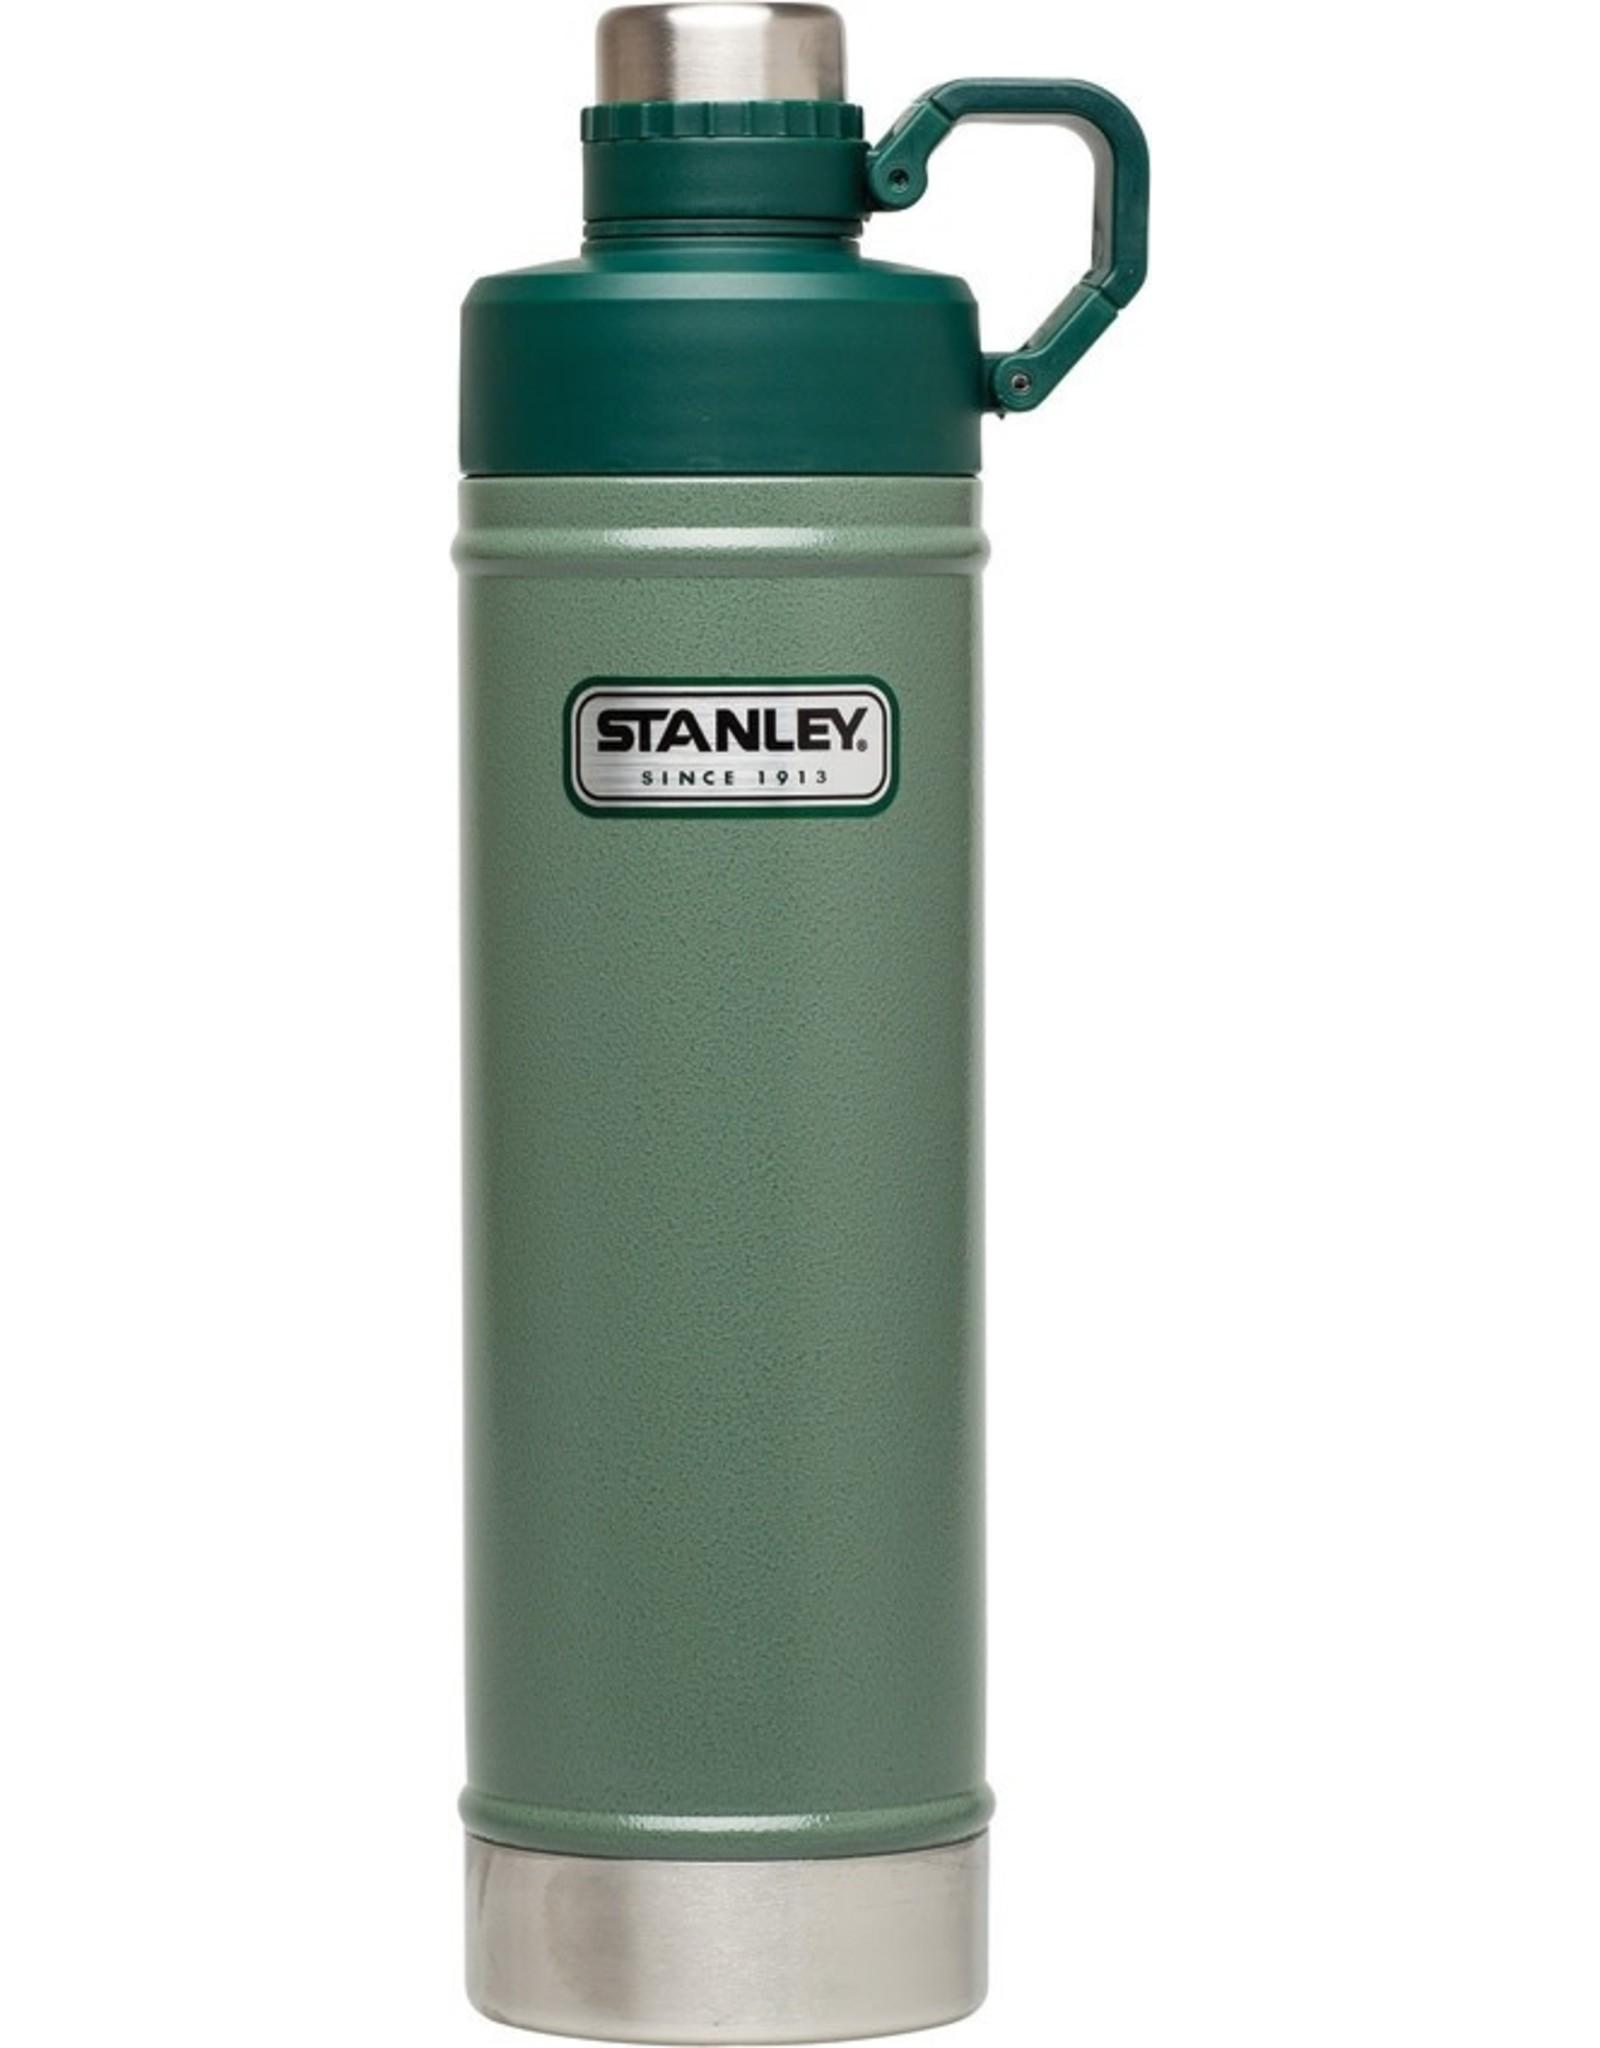 Stanley Easy Clean Water Bottle: 25oz.